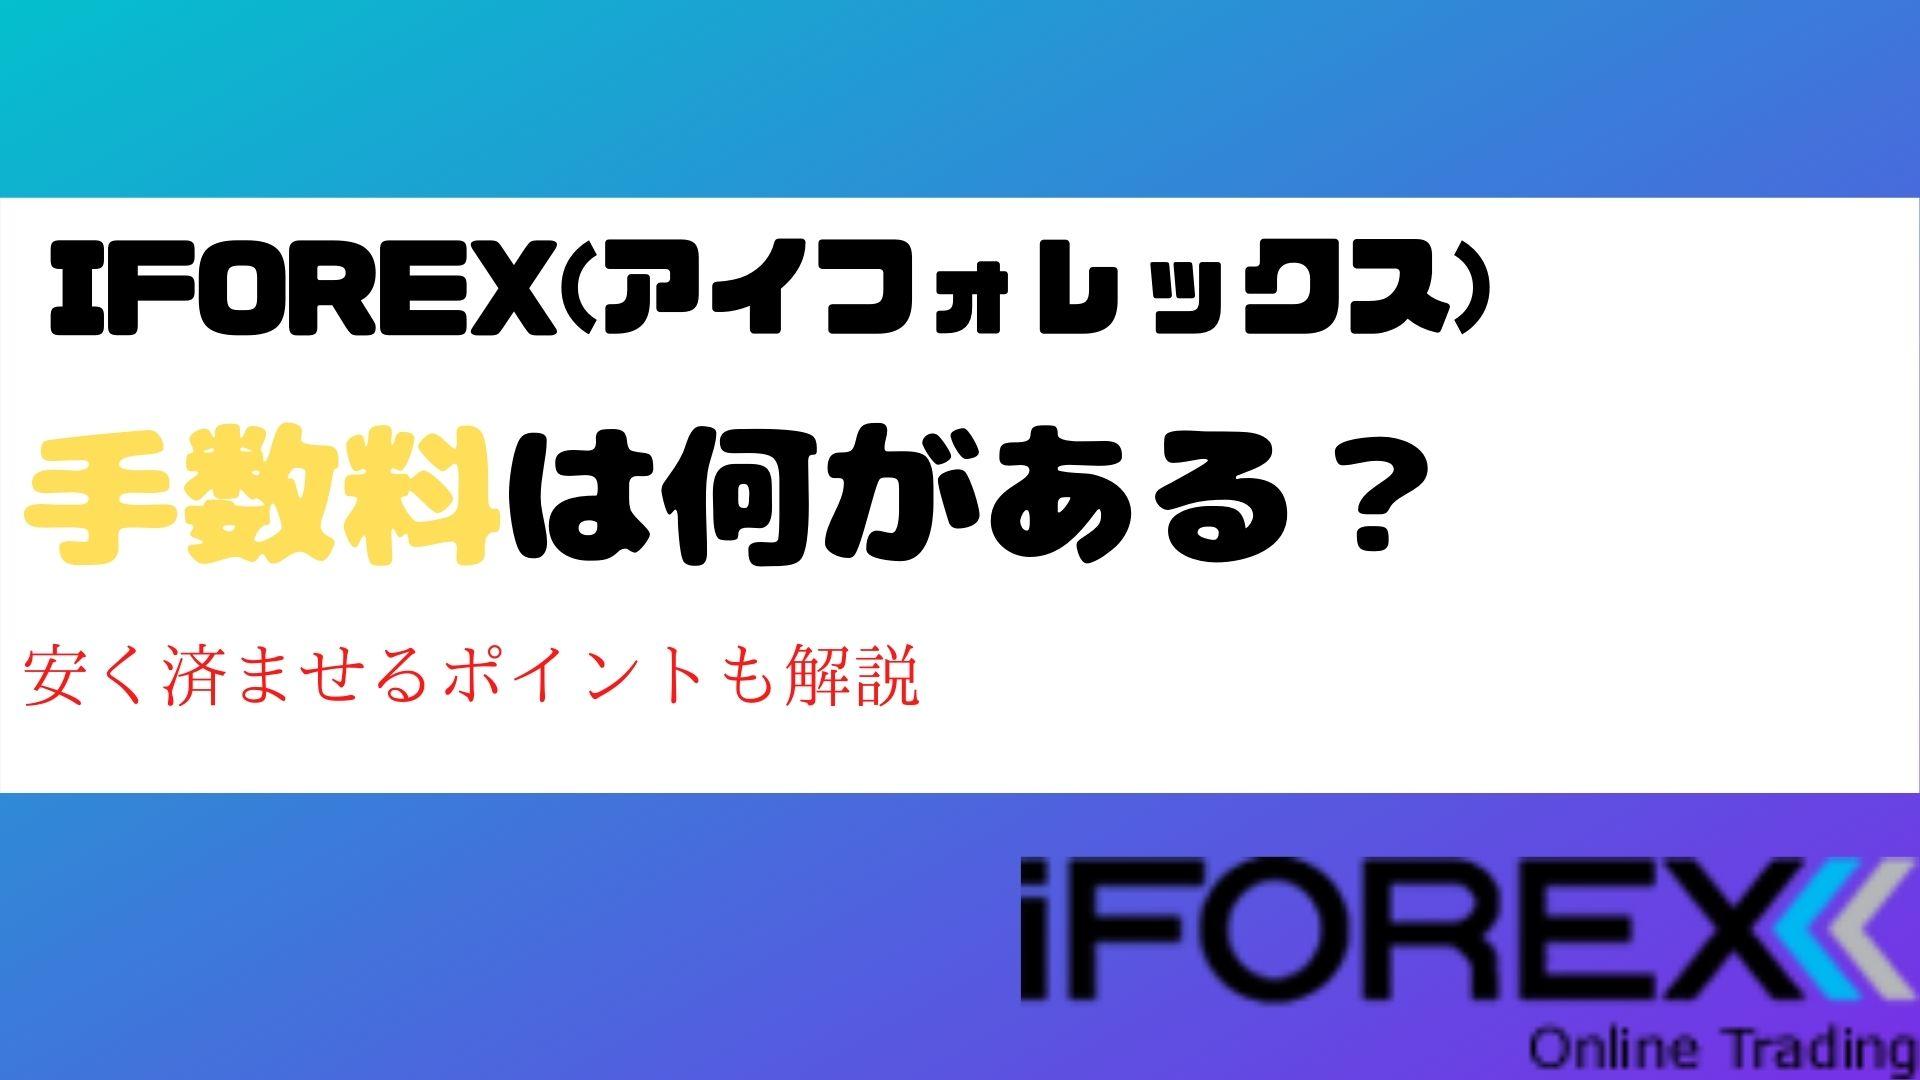 iforex-fee-title